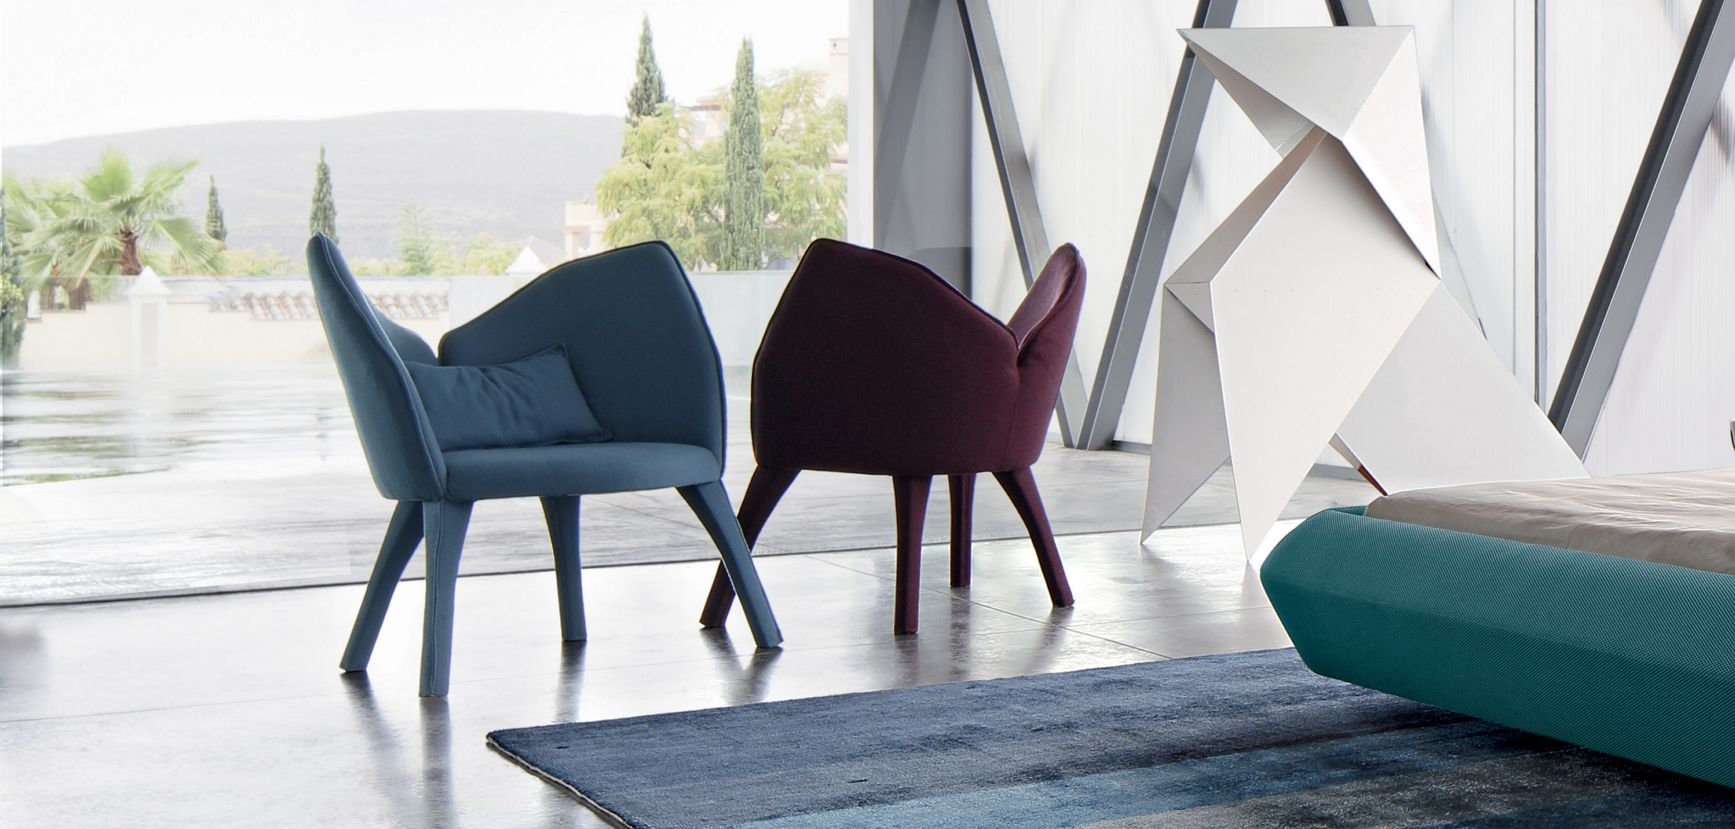 fauteuil r sultats correspondant votre recherche roche. Black Bedroom Furniture Sets. Home Design Ideas